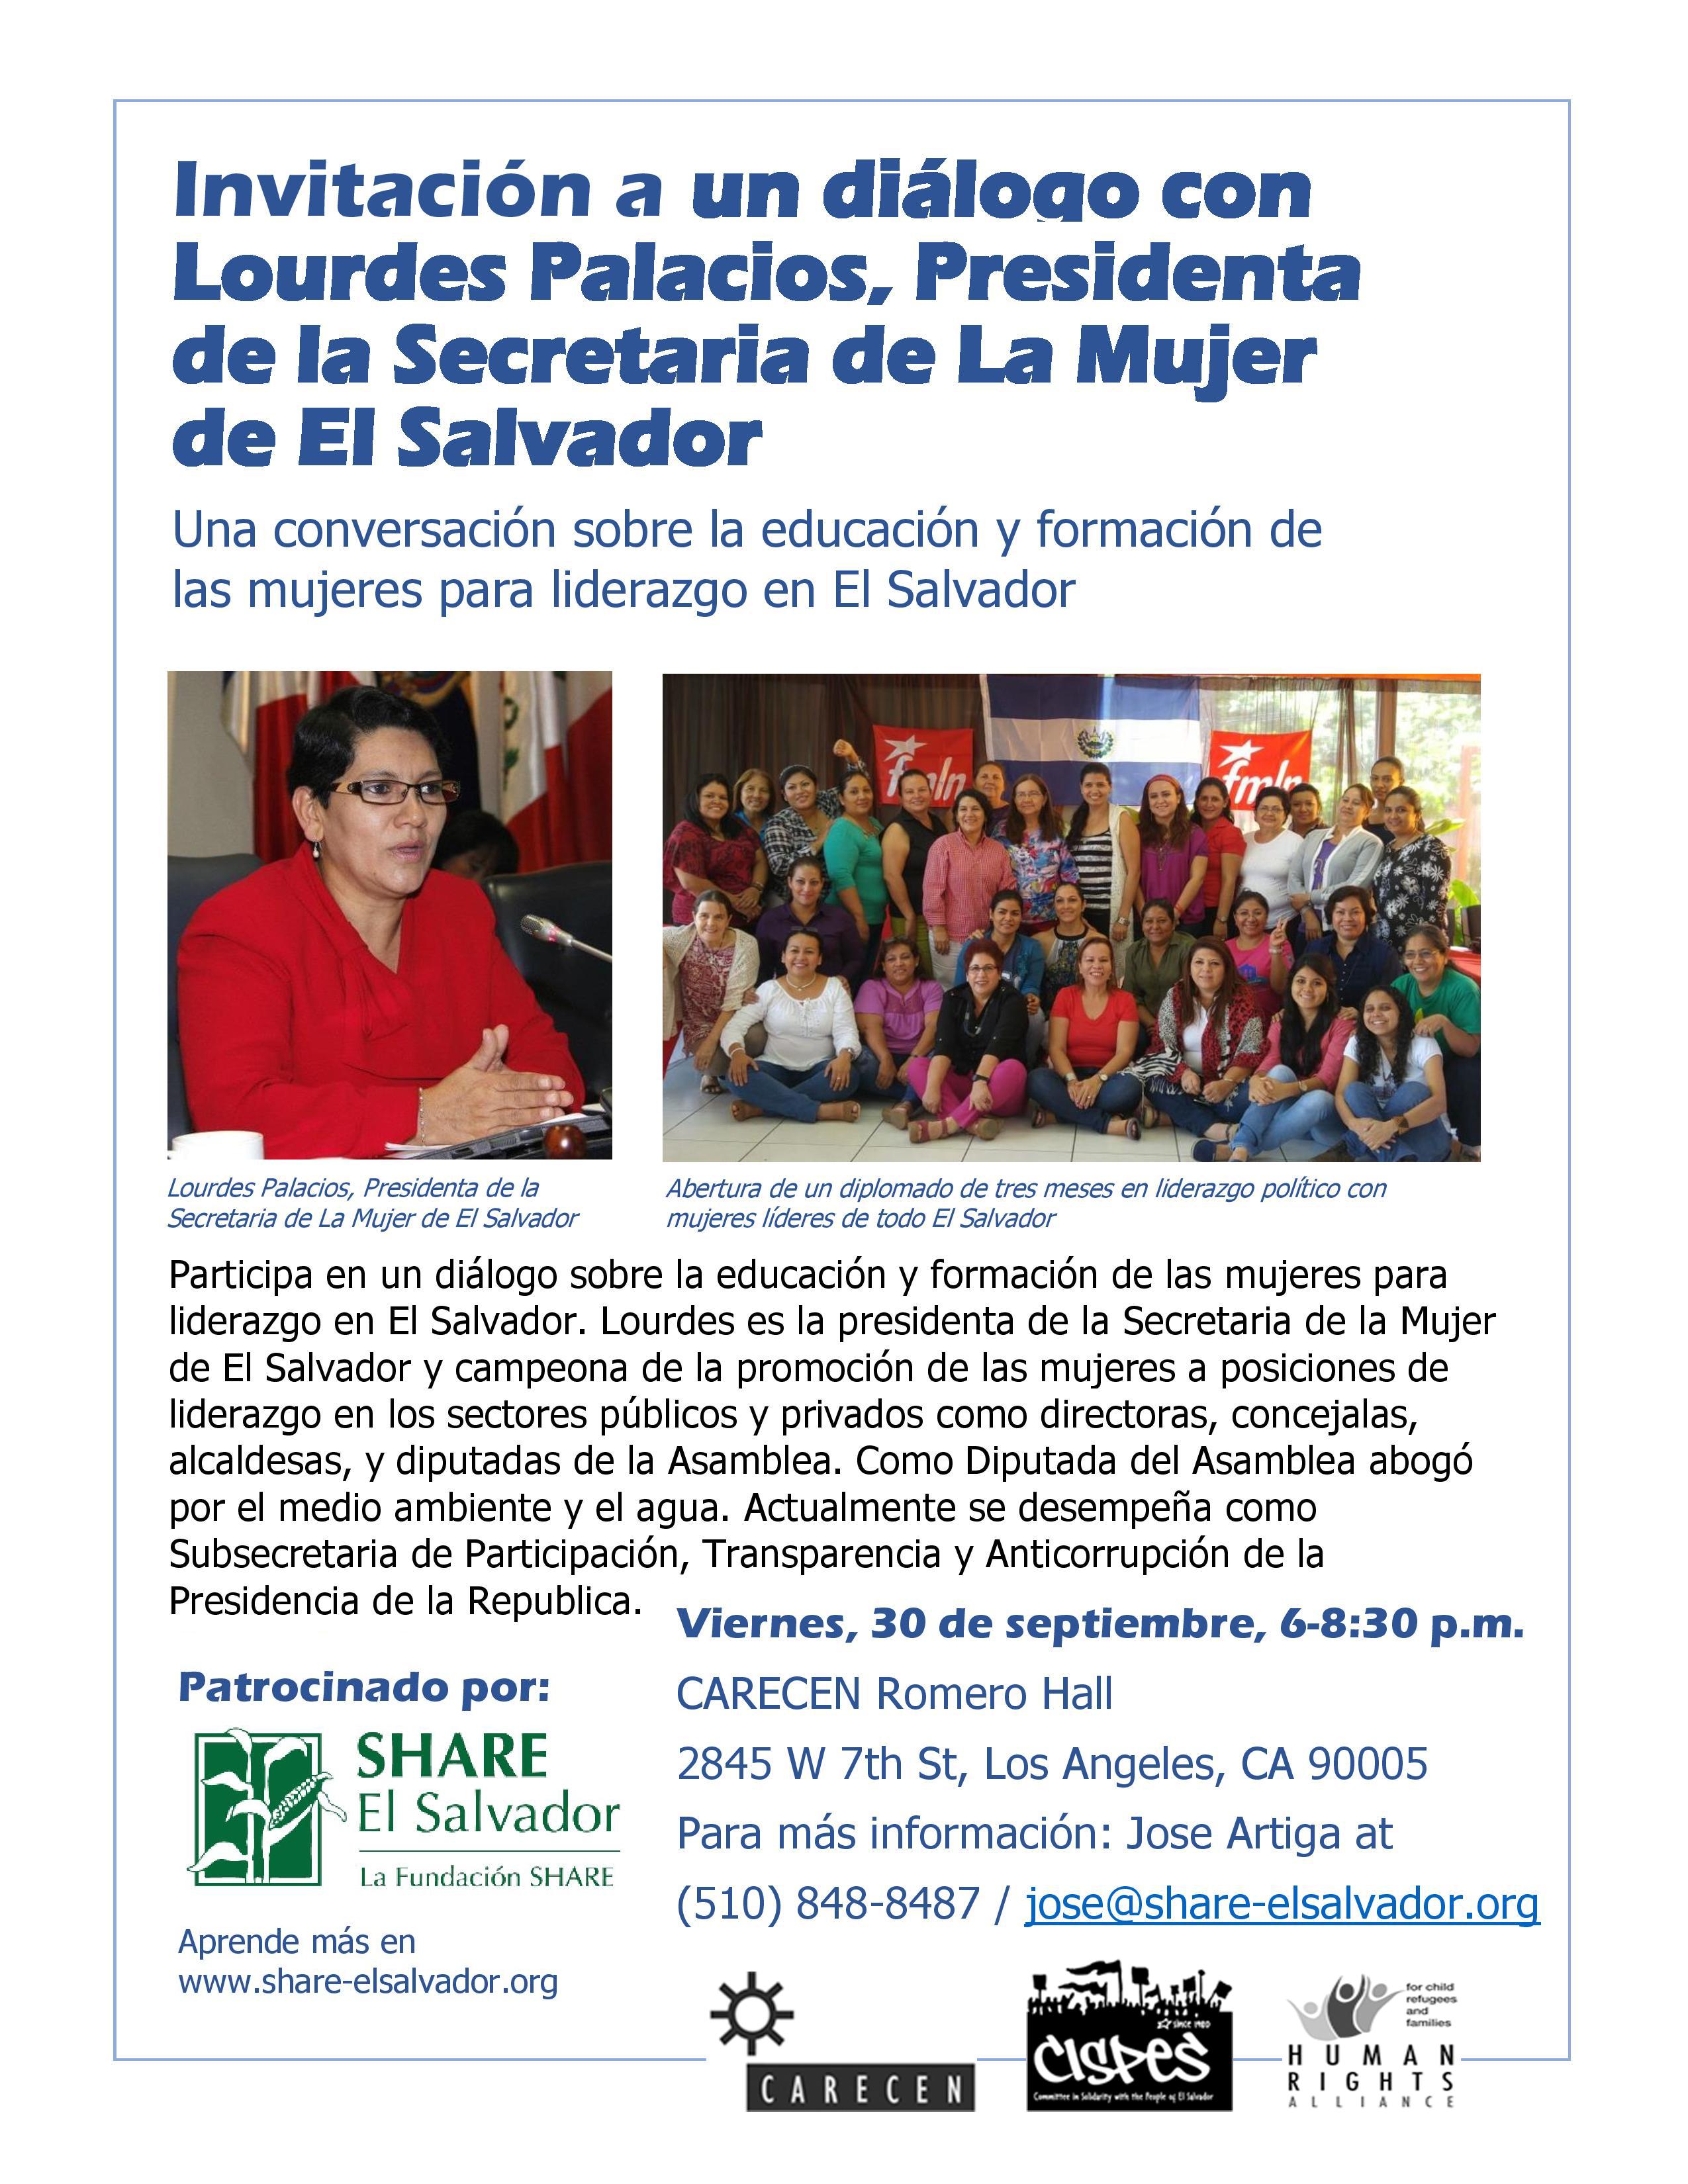 Lourdes_Palacios_flyer_Spanish-page-001.jpg